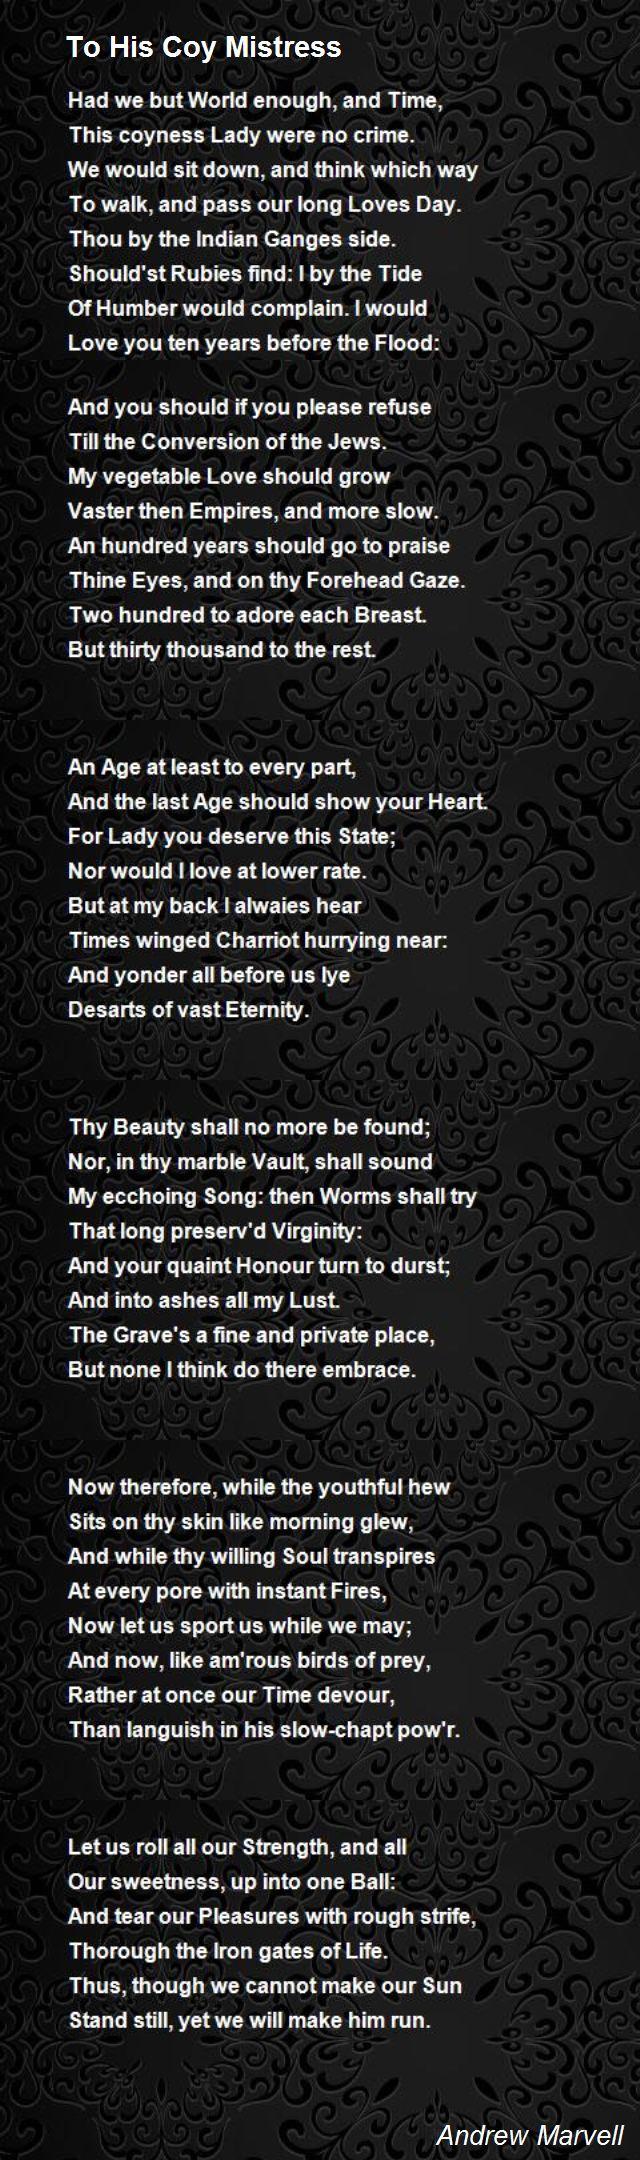 Mistress Poems